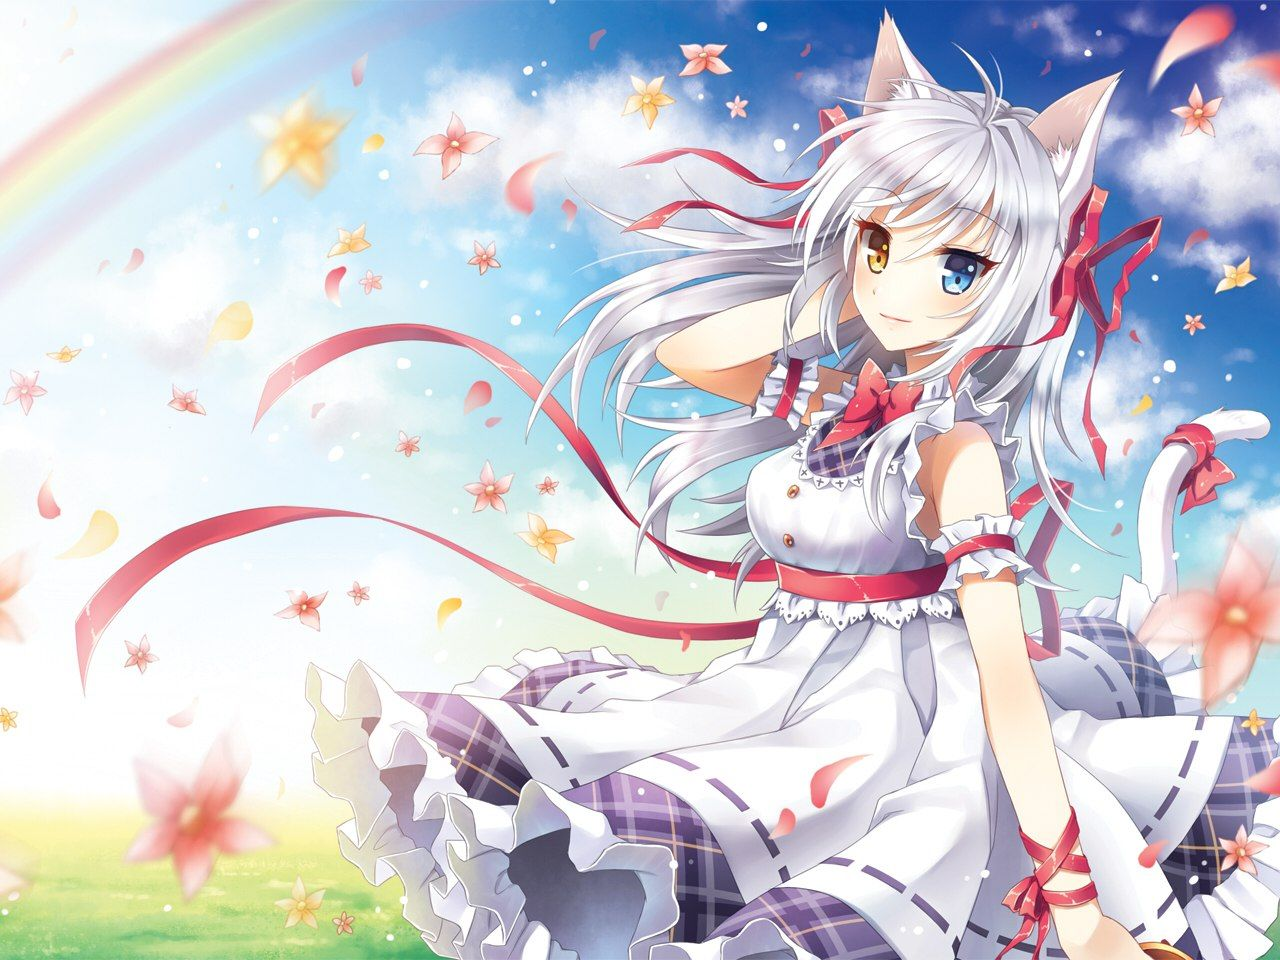 Anime Cat Girl with White Hair Wallpaper Nekomimi, Cat